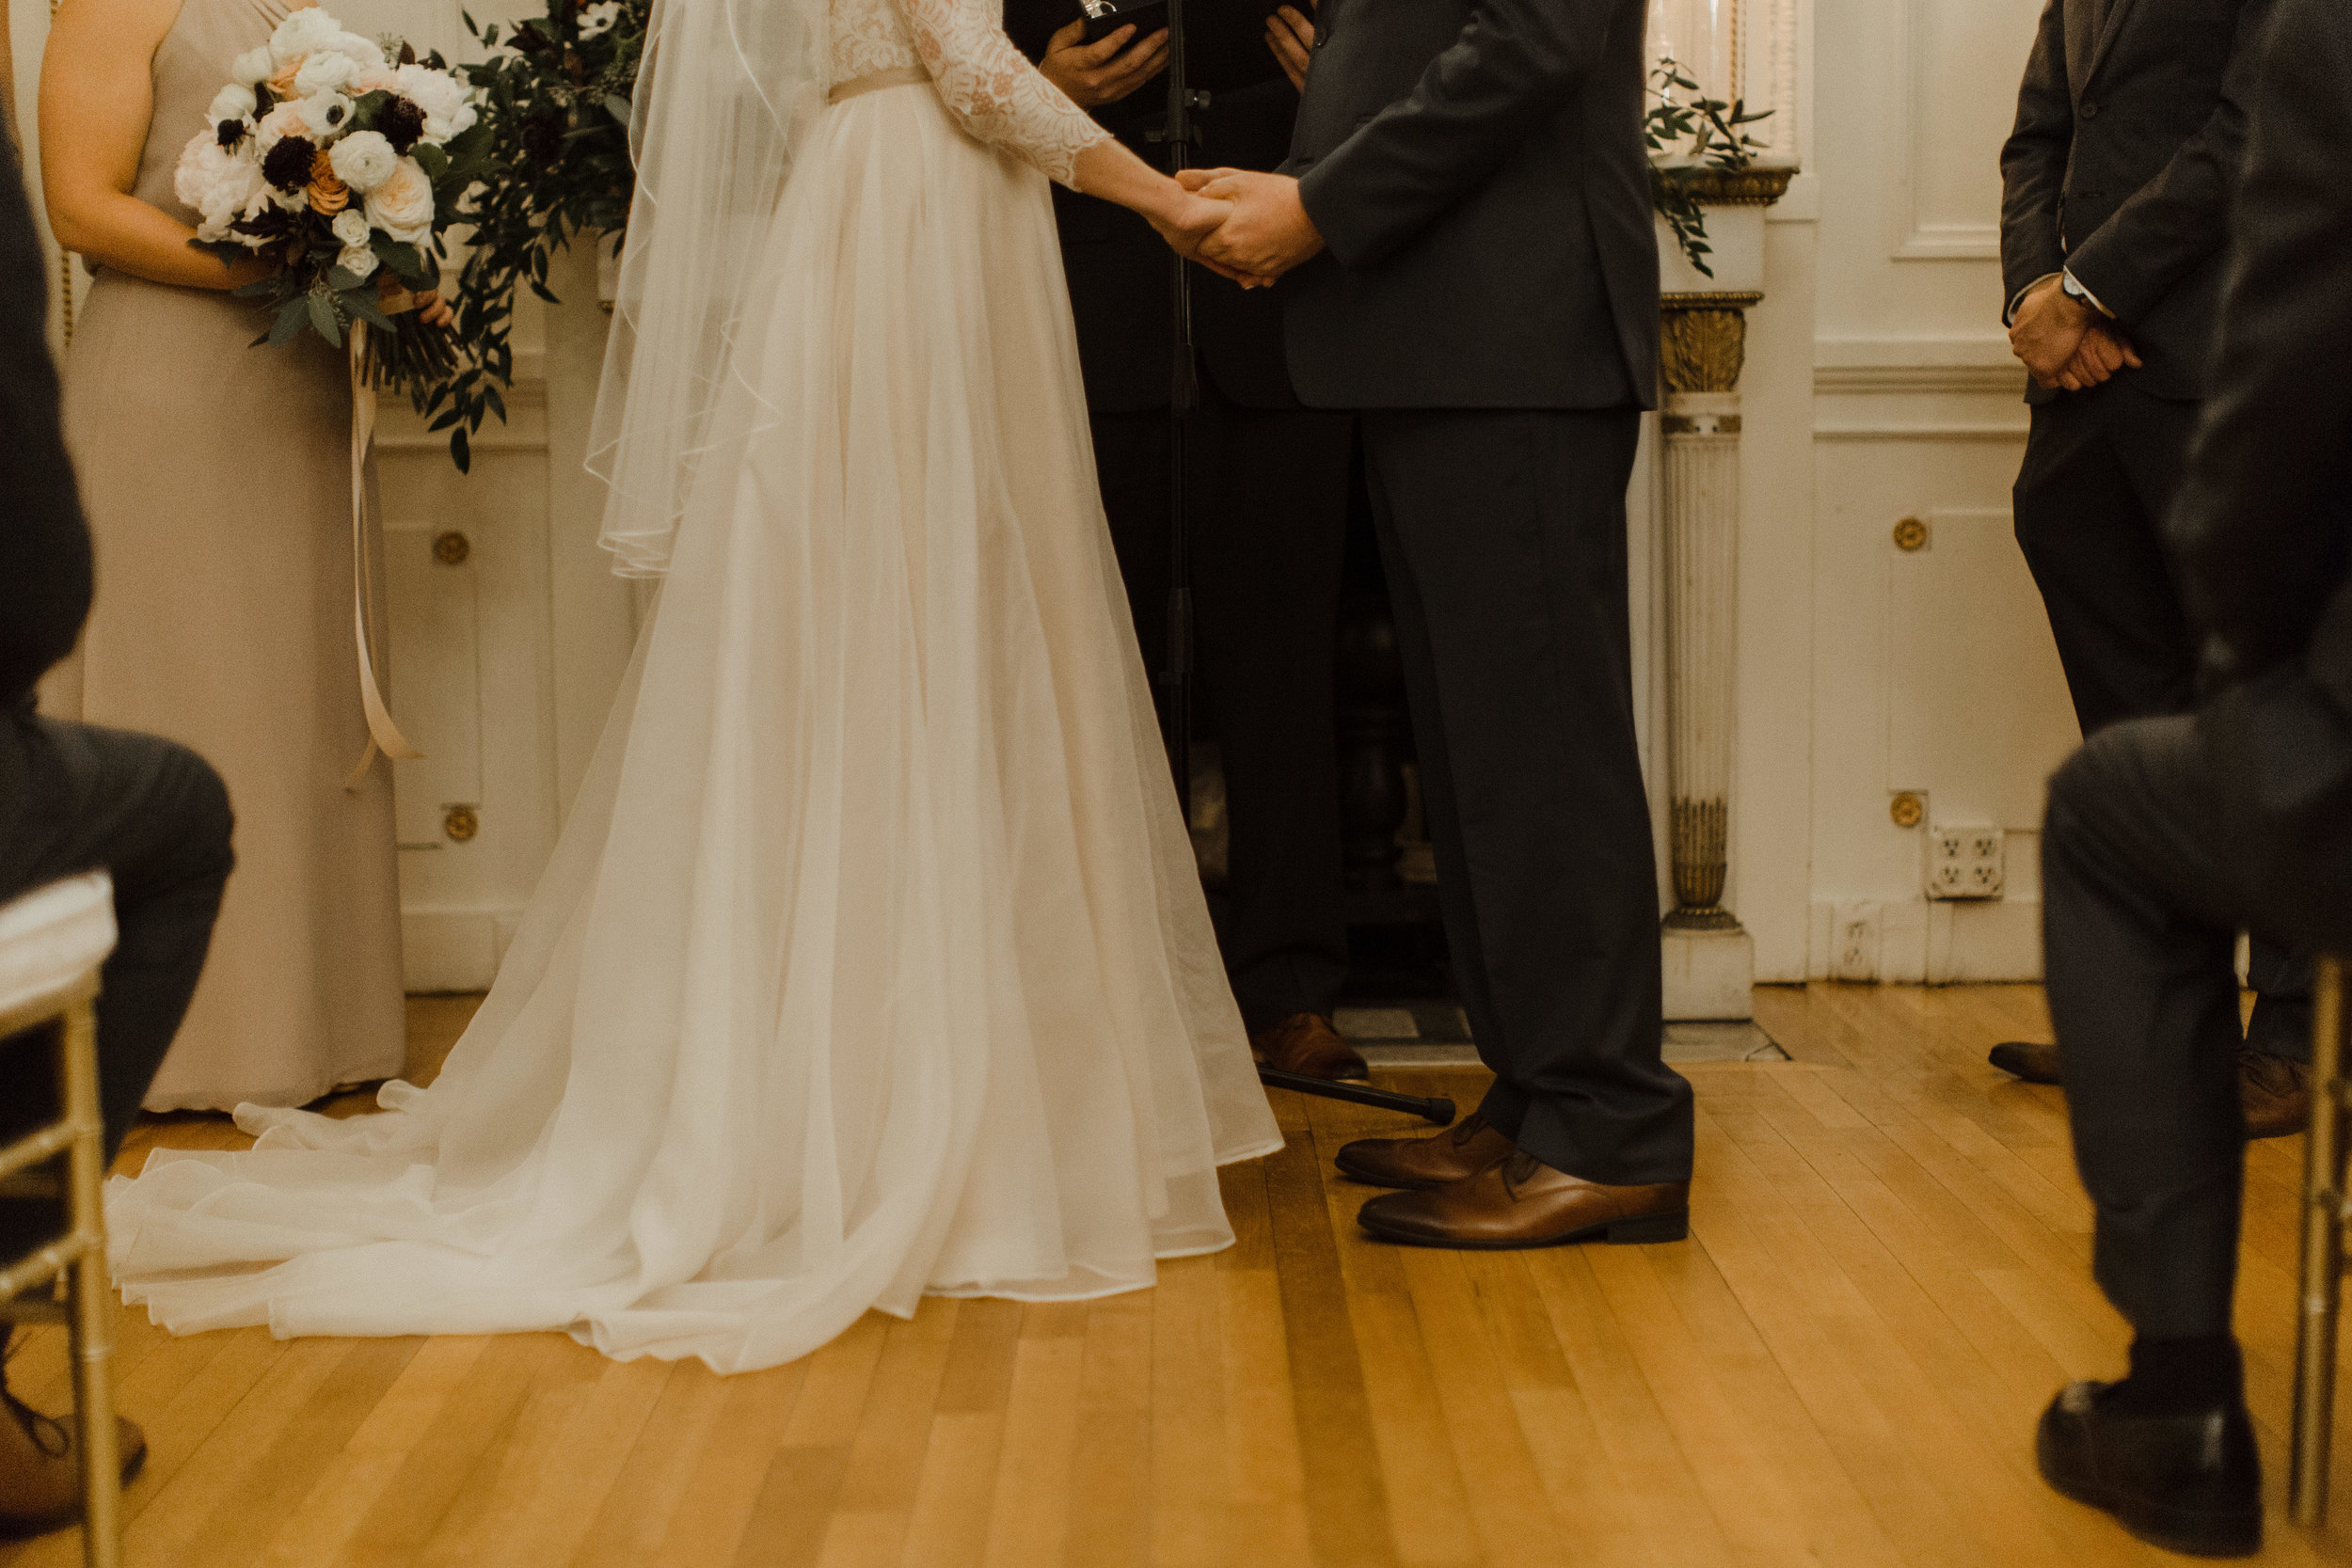 beverly_ma_wedding-65.jpg